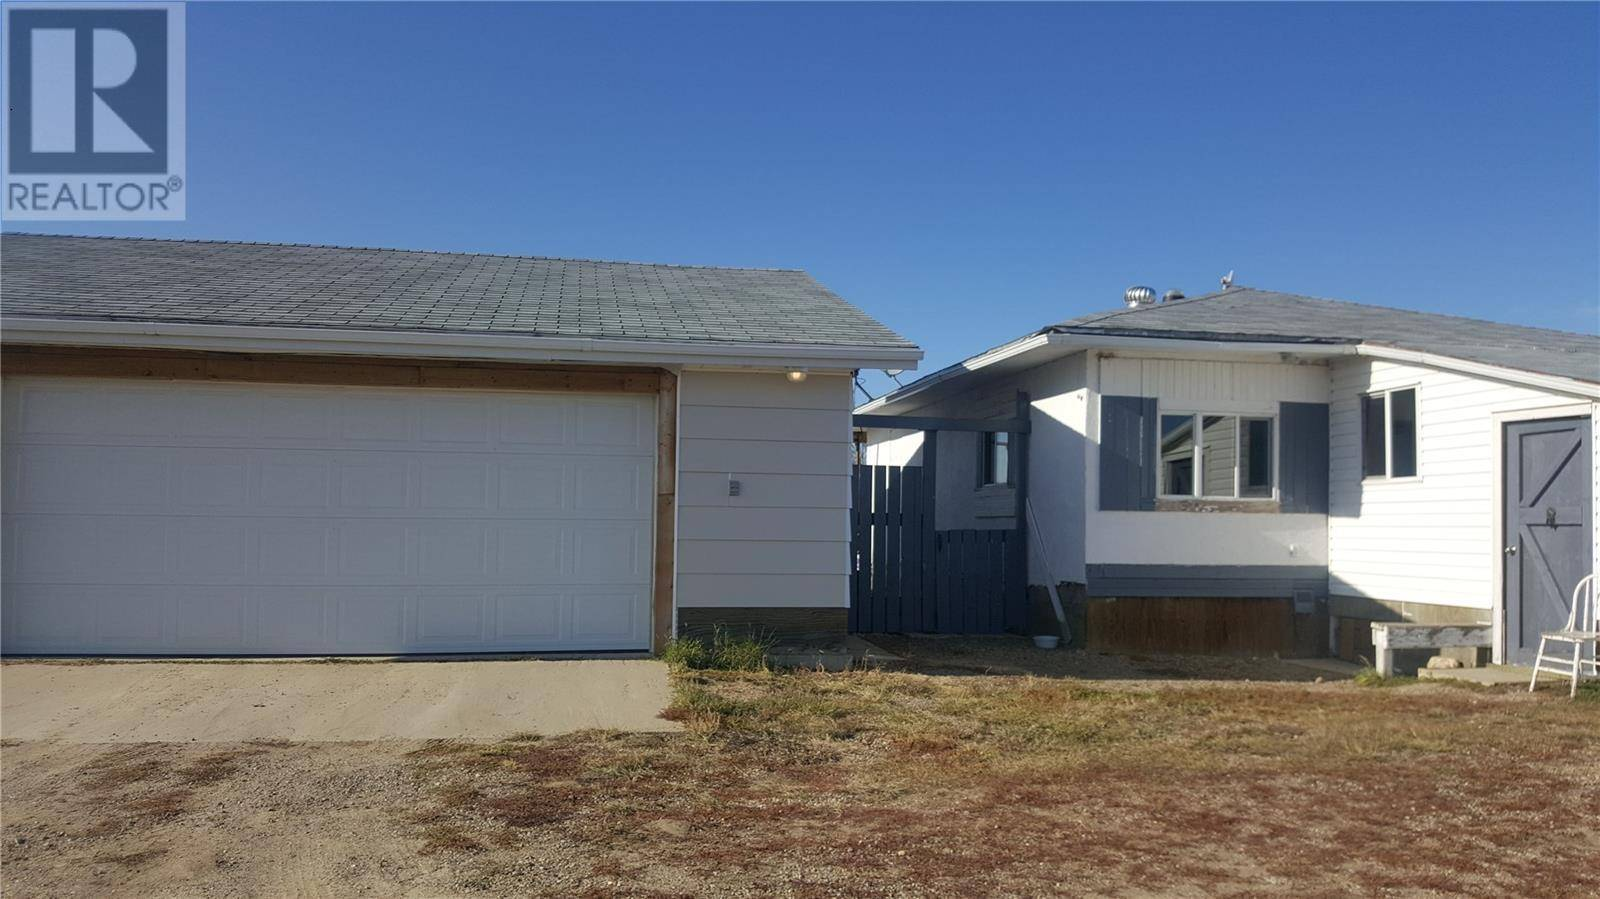 House for sale at  Furseth Acreage  Swift Current Rm No. 137 Saskatchewan - MLS: SK790369